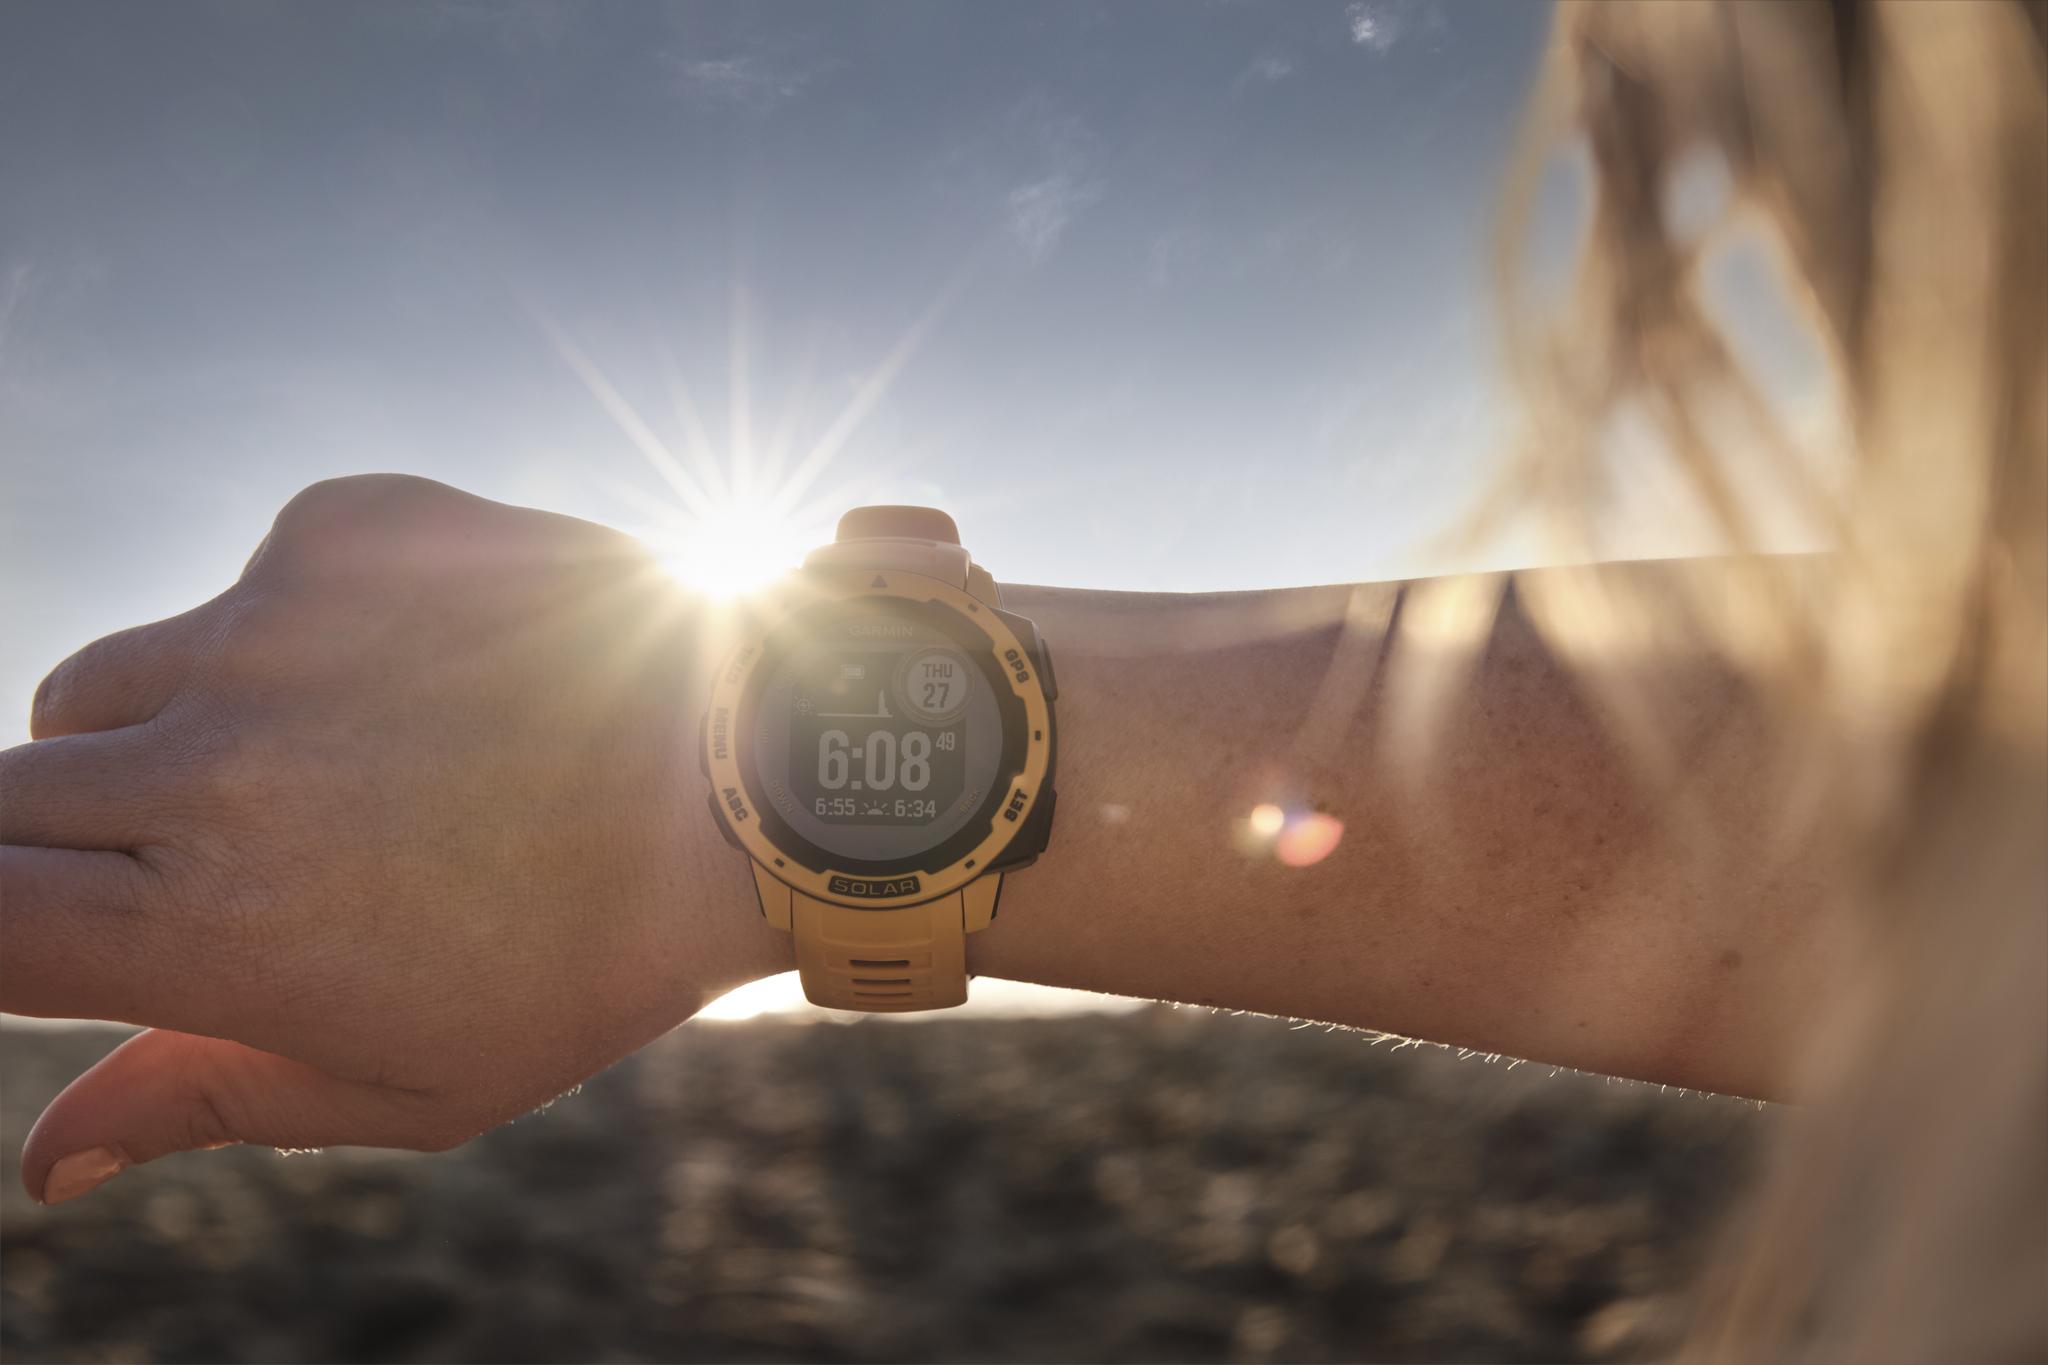 Introducing the Garmin Solar Watches